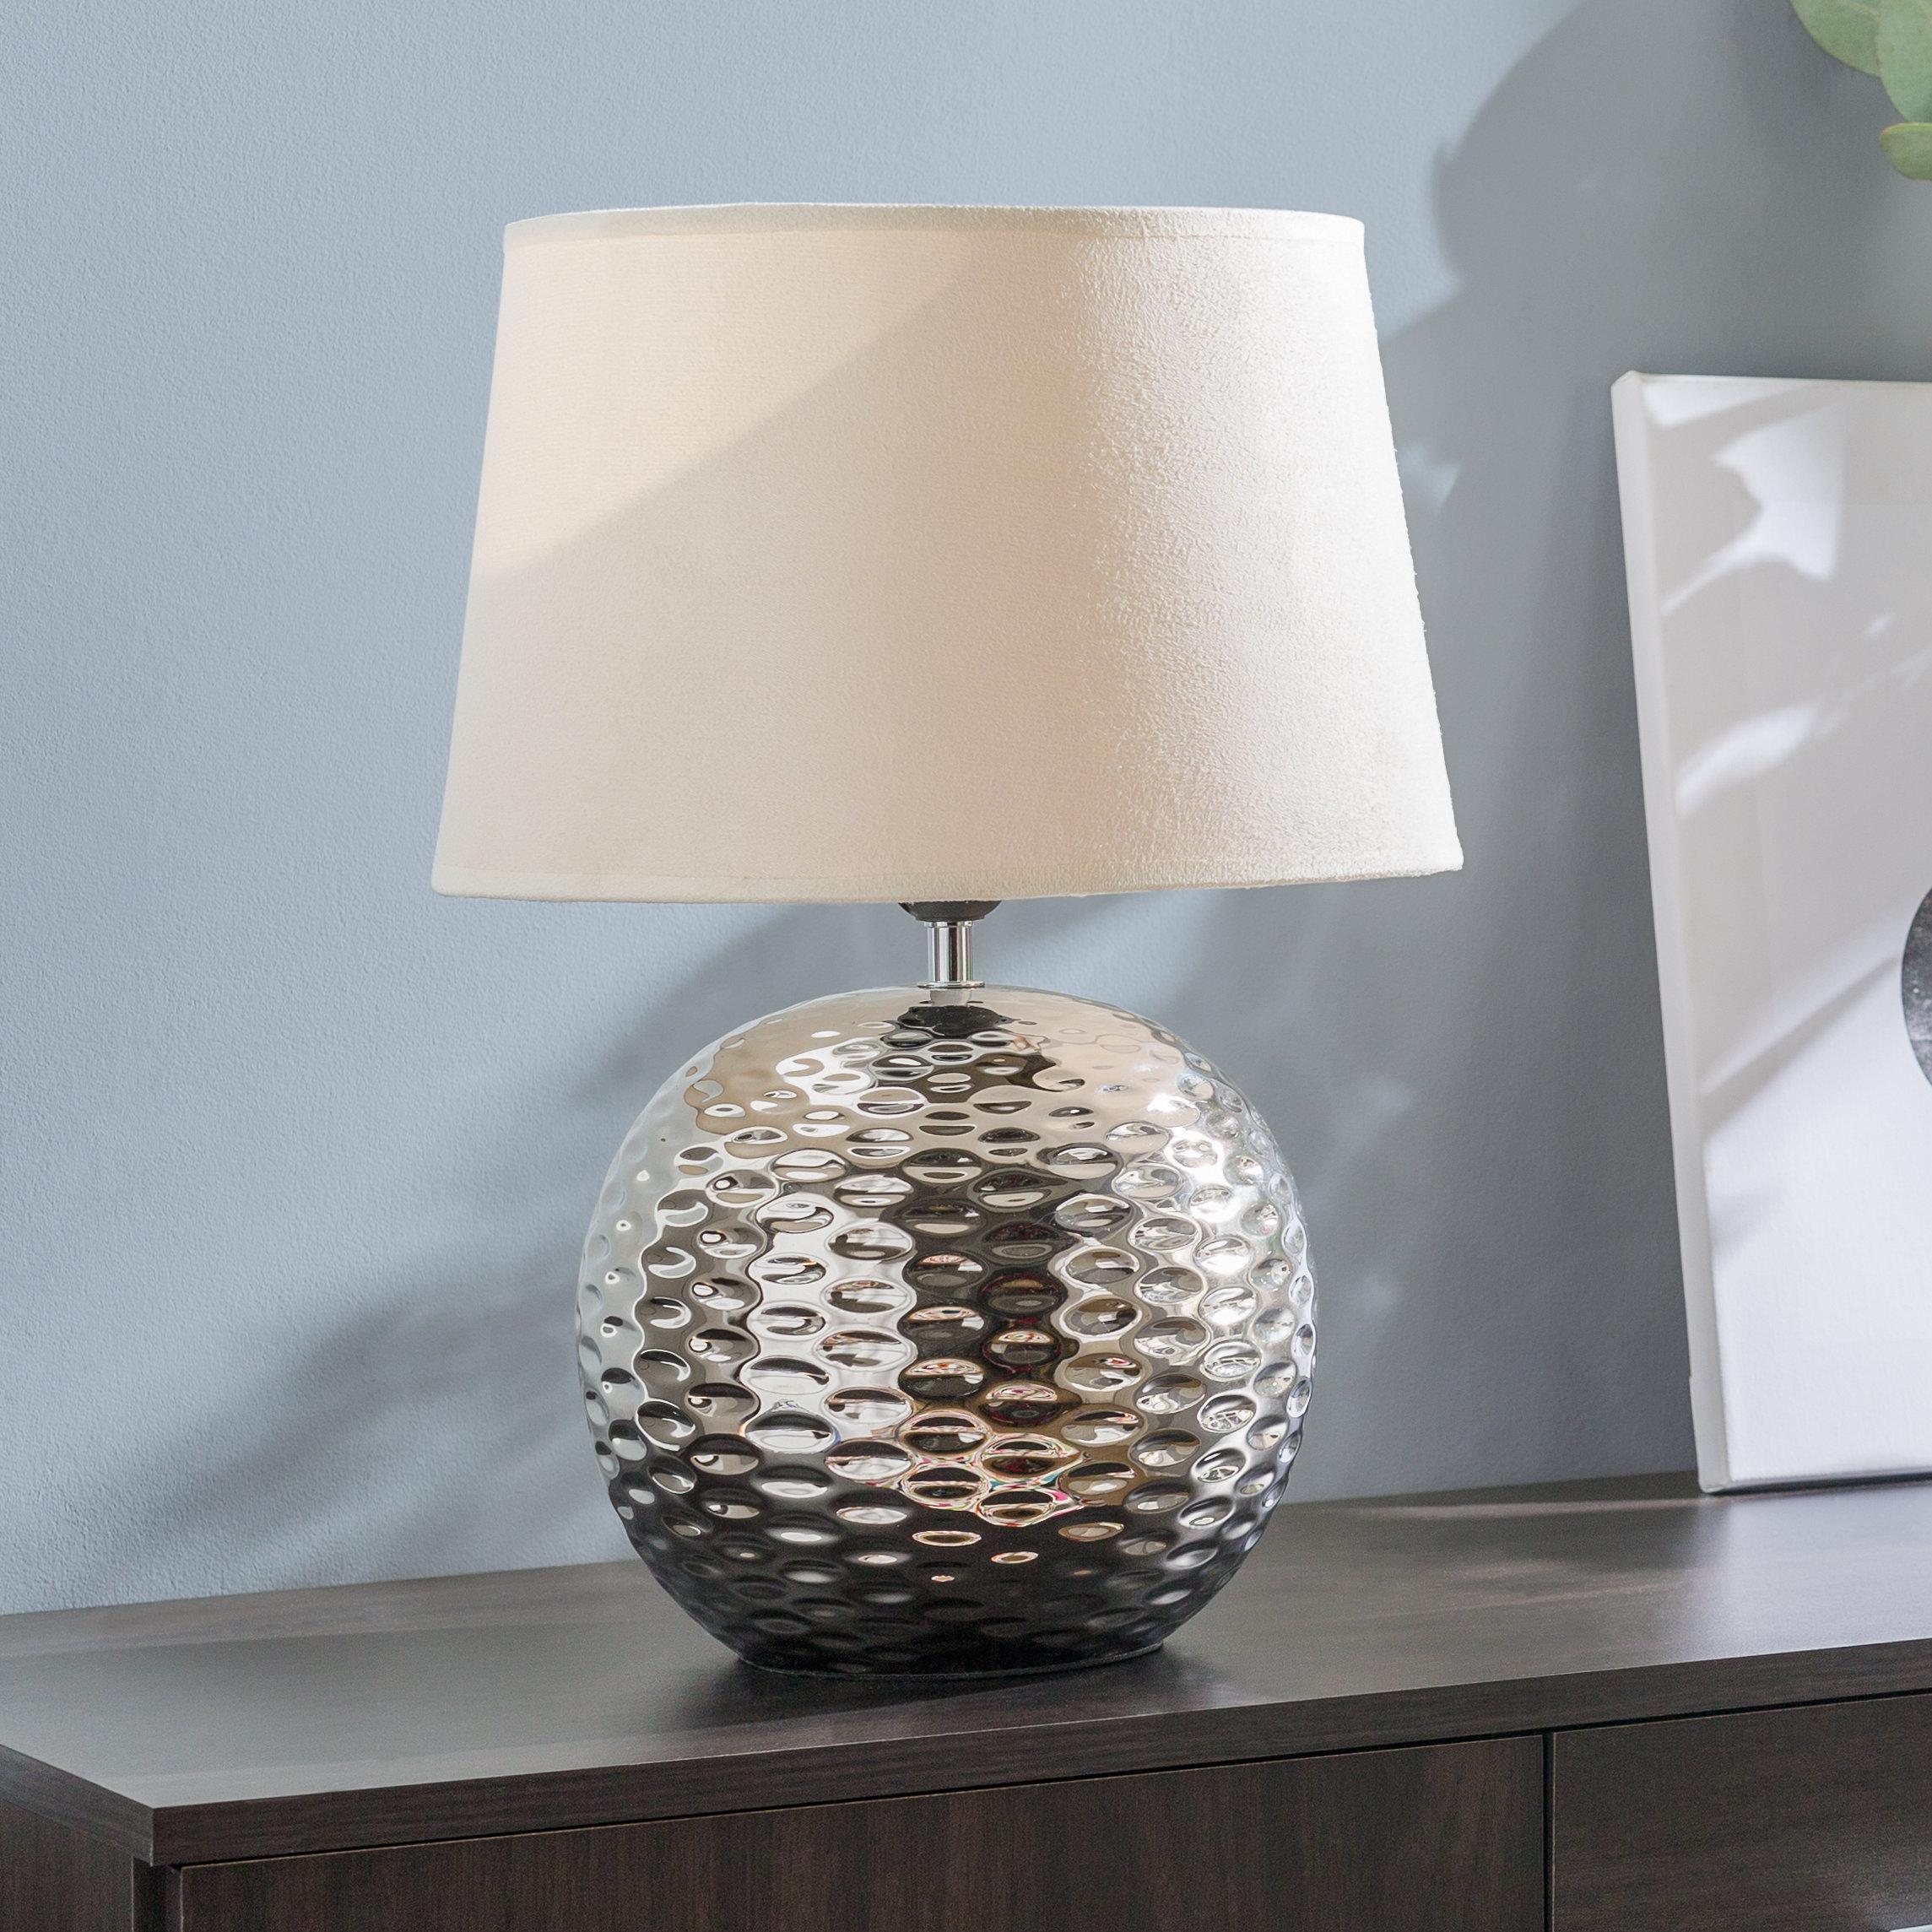 on sale 7c661 c930e Ariana 42cm Bedside Lamp